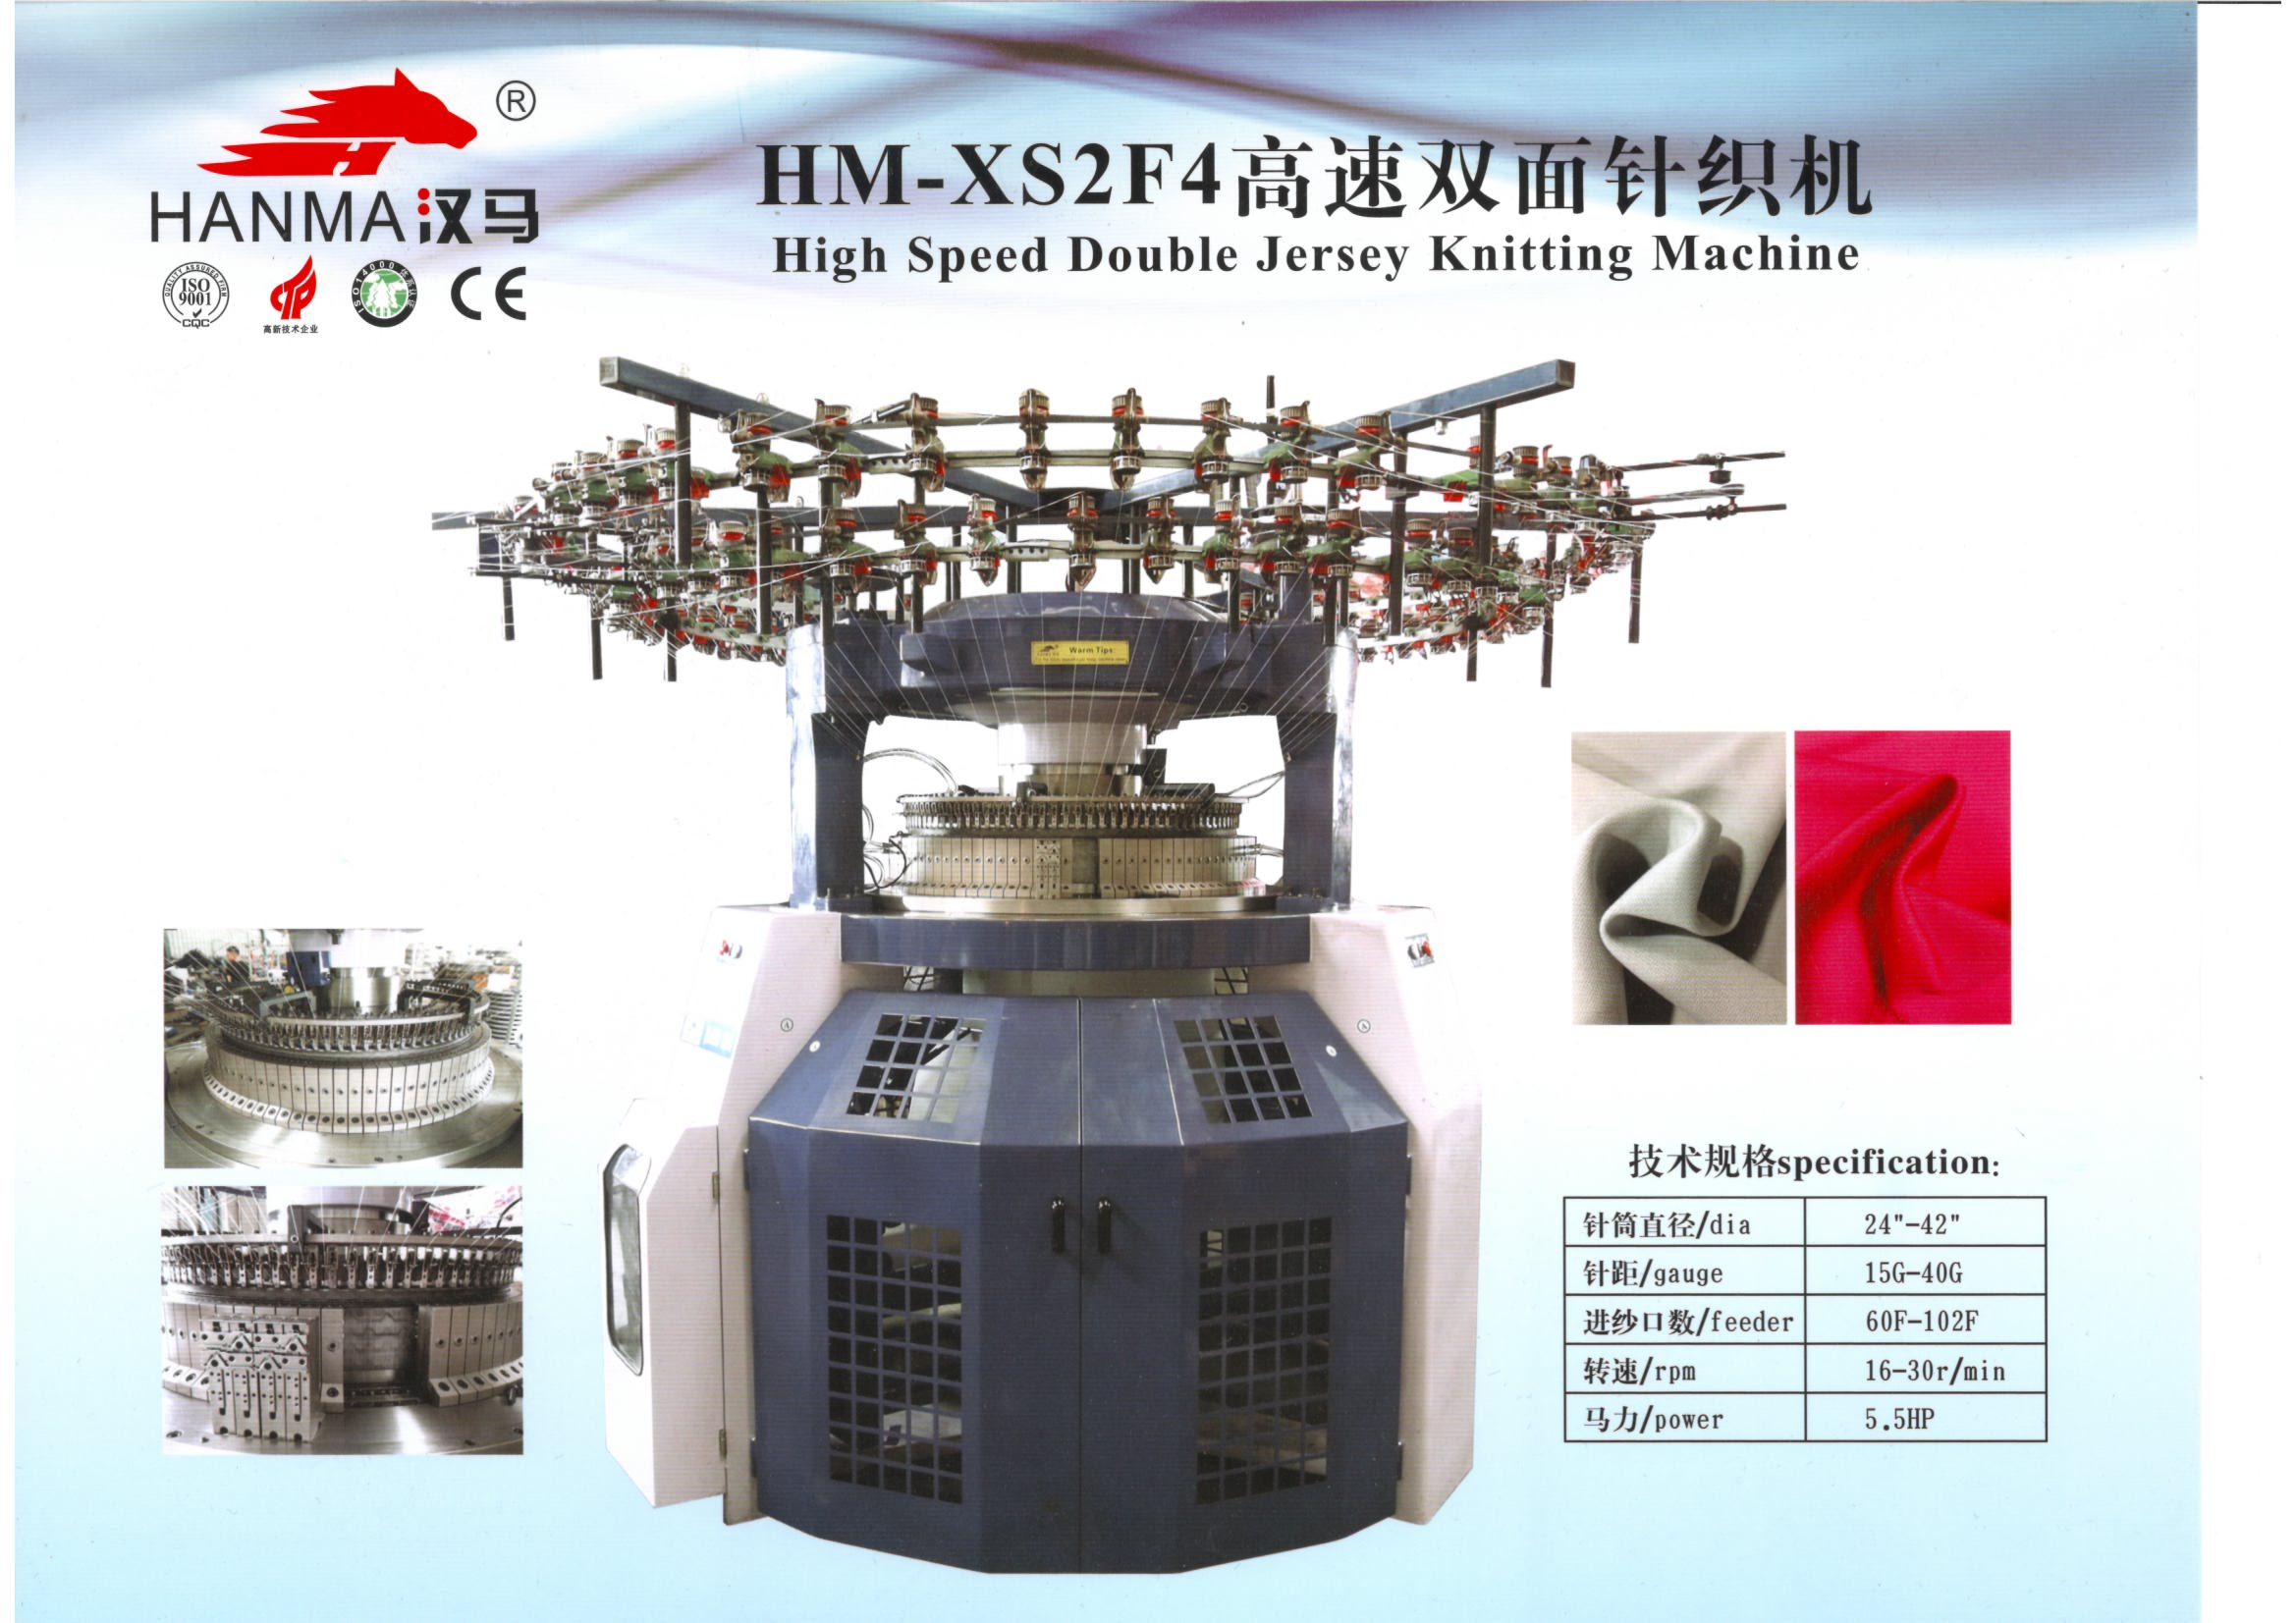 High Speed Double Jersey Knitting Machine